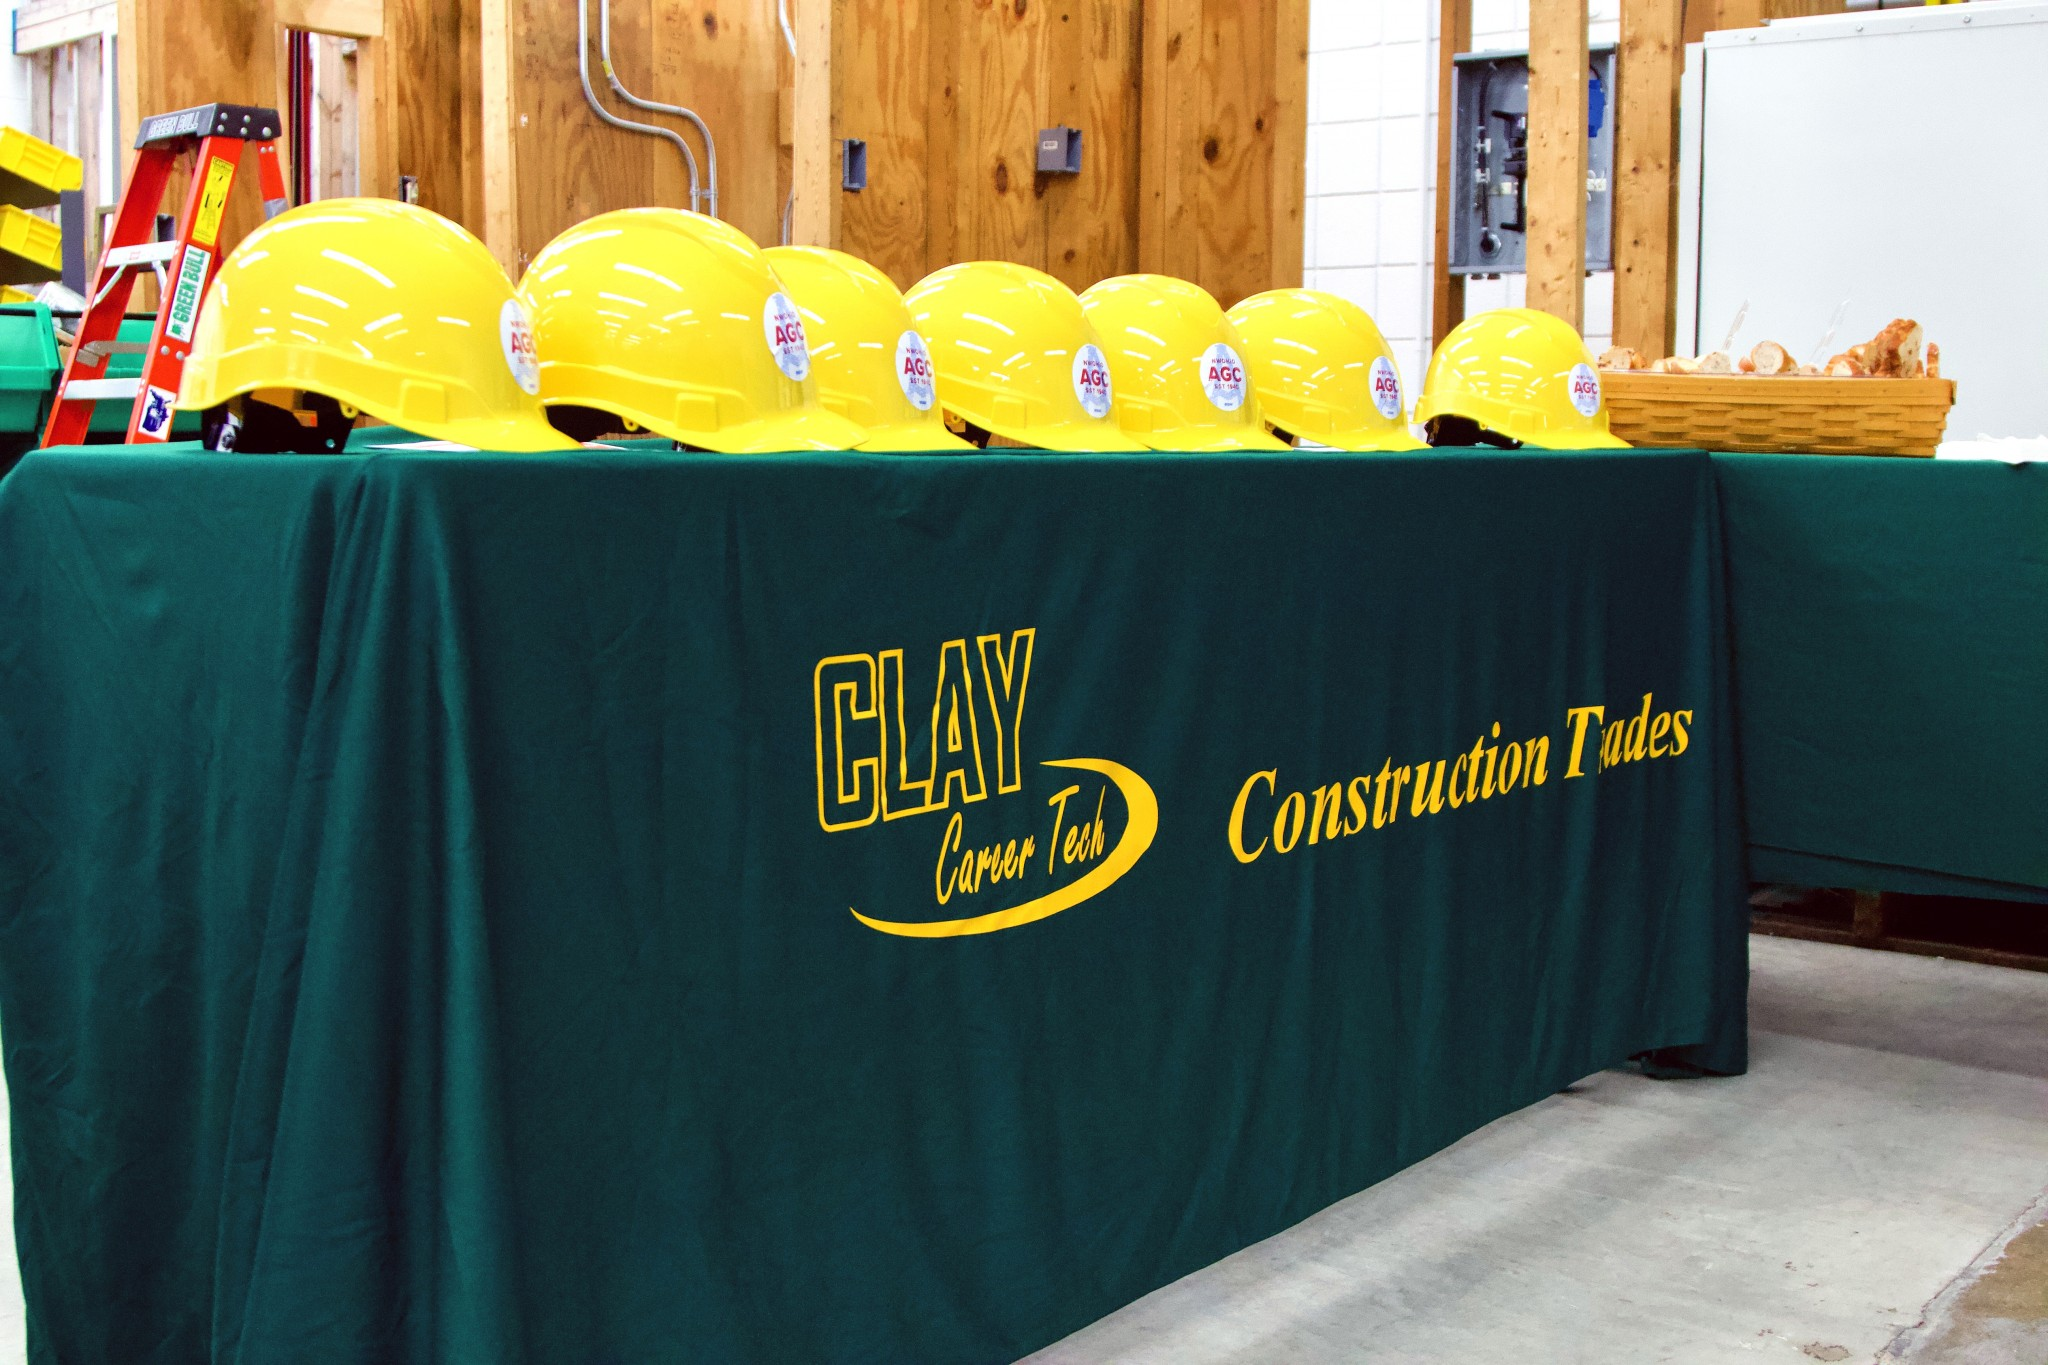 (Photo courtesy of Associated General Contractors of Northwest Ohio)